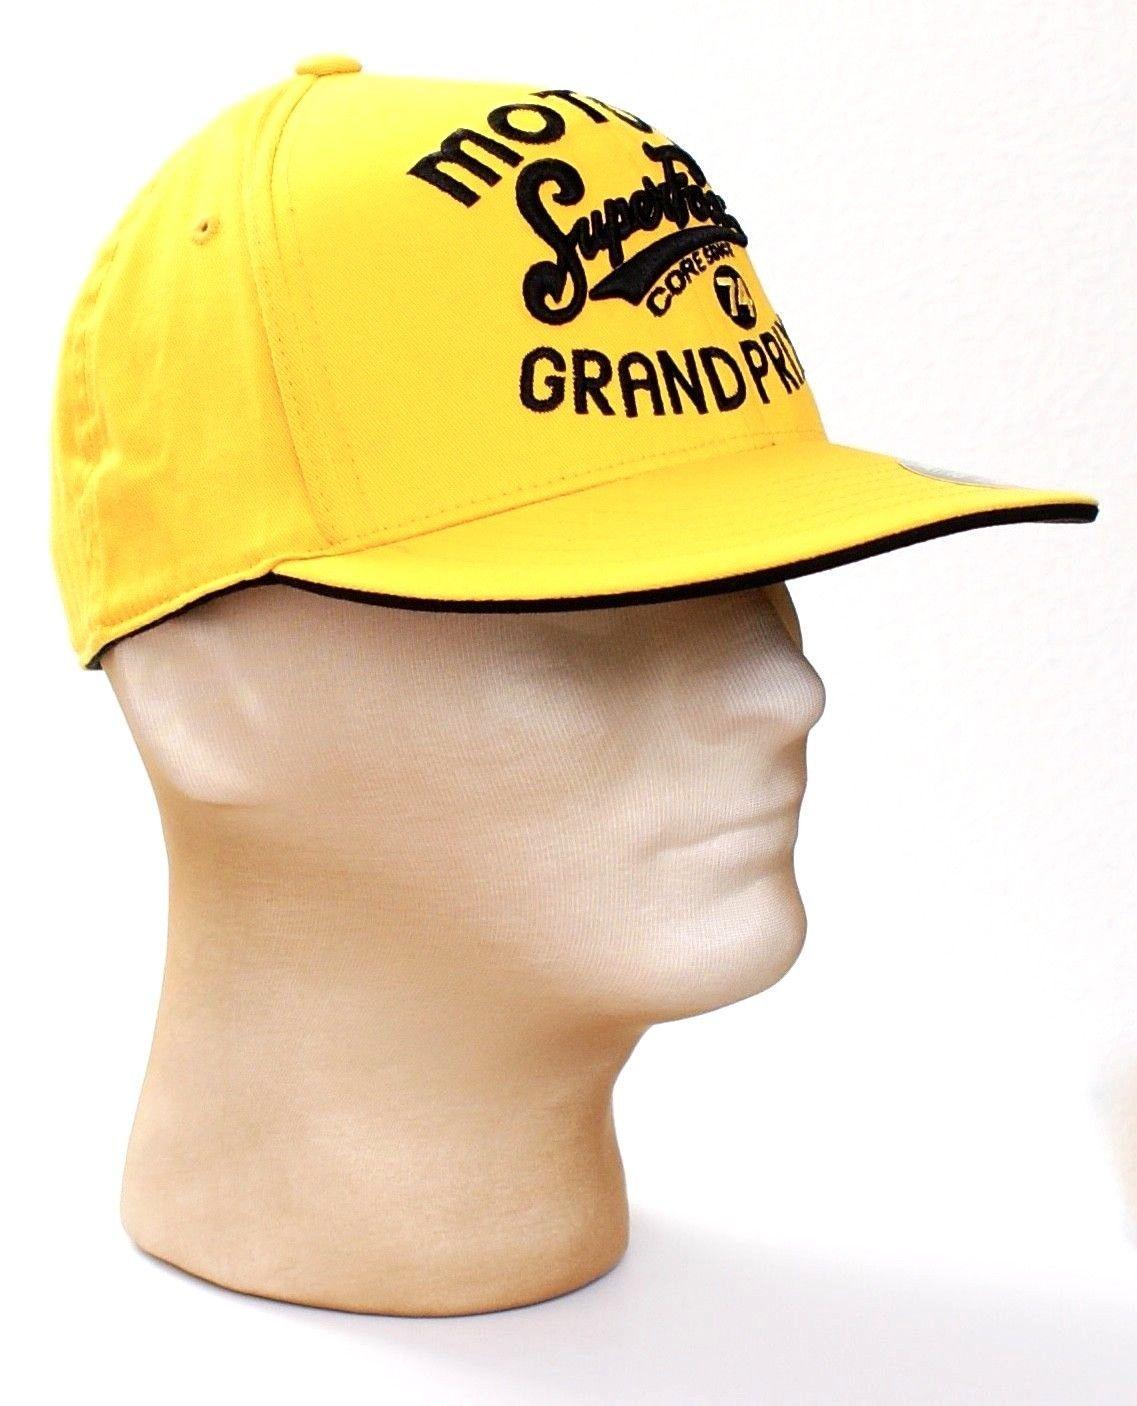 Fox Moto X Super Fox Grand Prix Yellow Cap Hat Adult Fitted 6 7/8 - 7 1/4 NWT